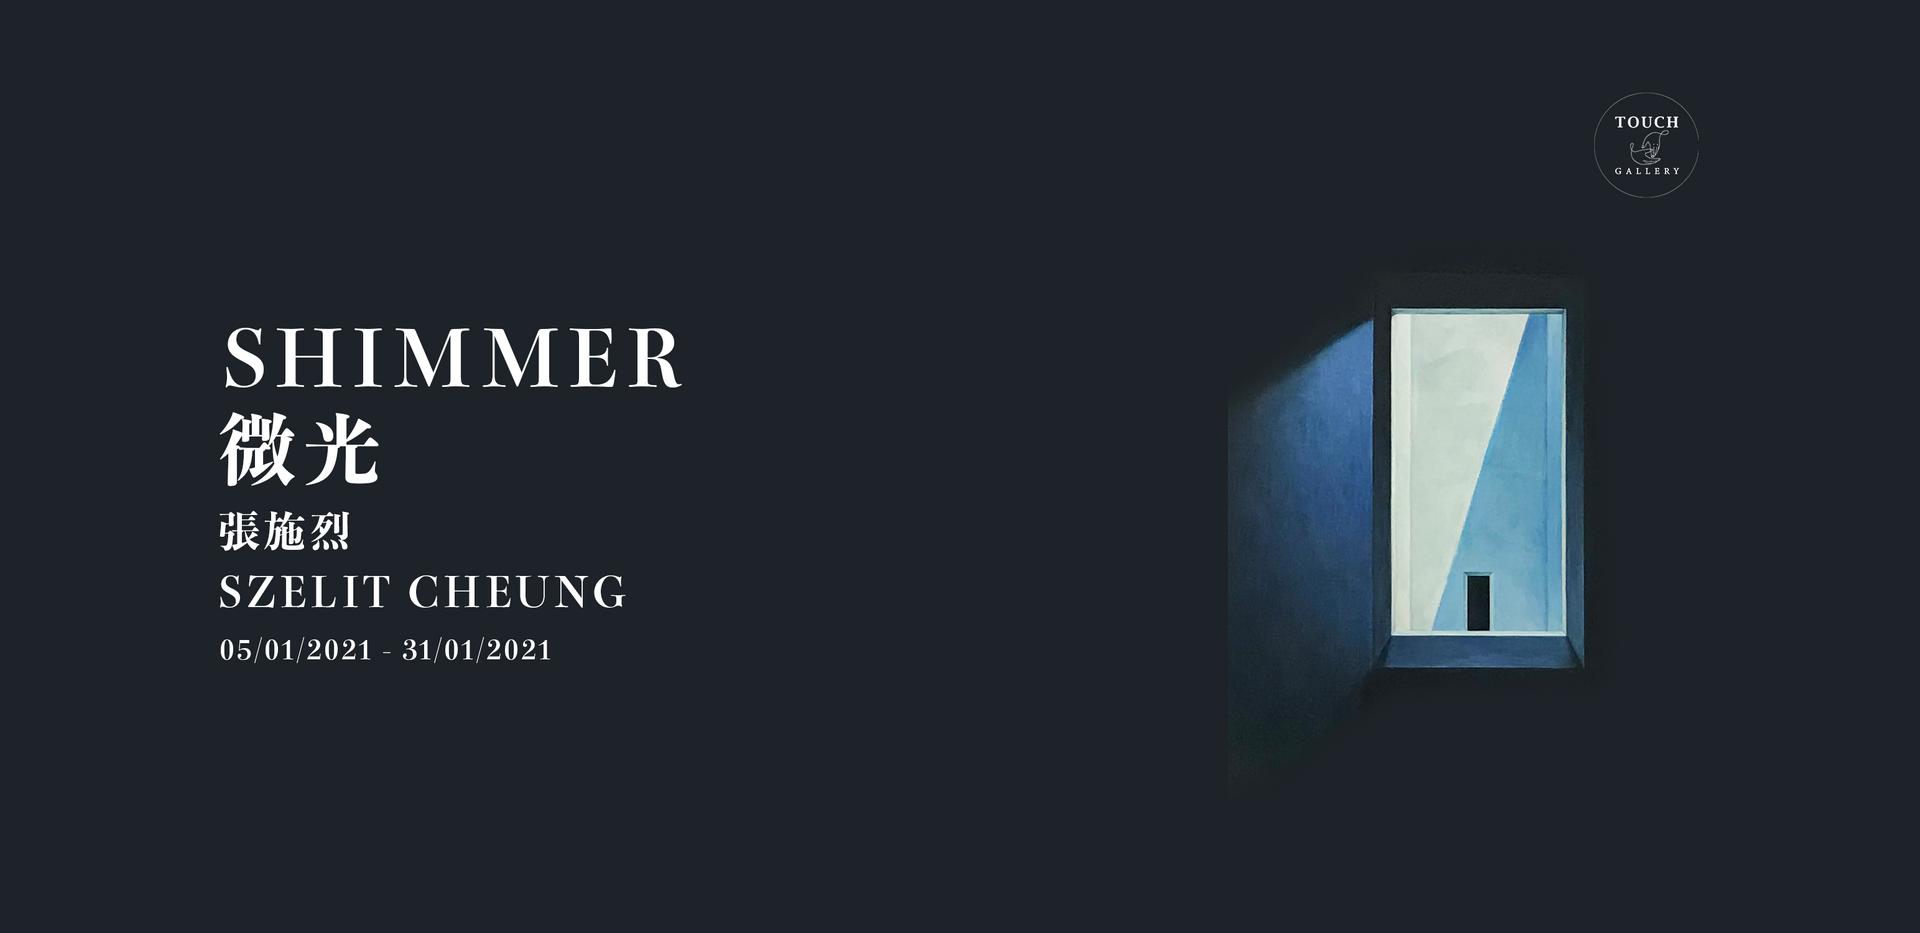 Szelit Cheung - web banner.png